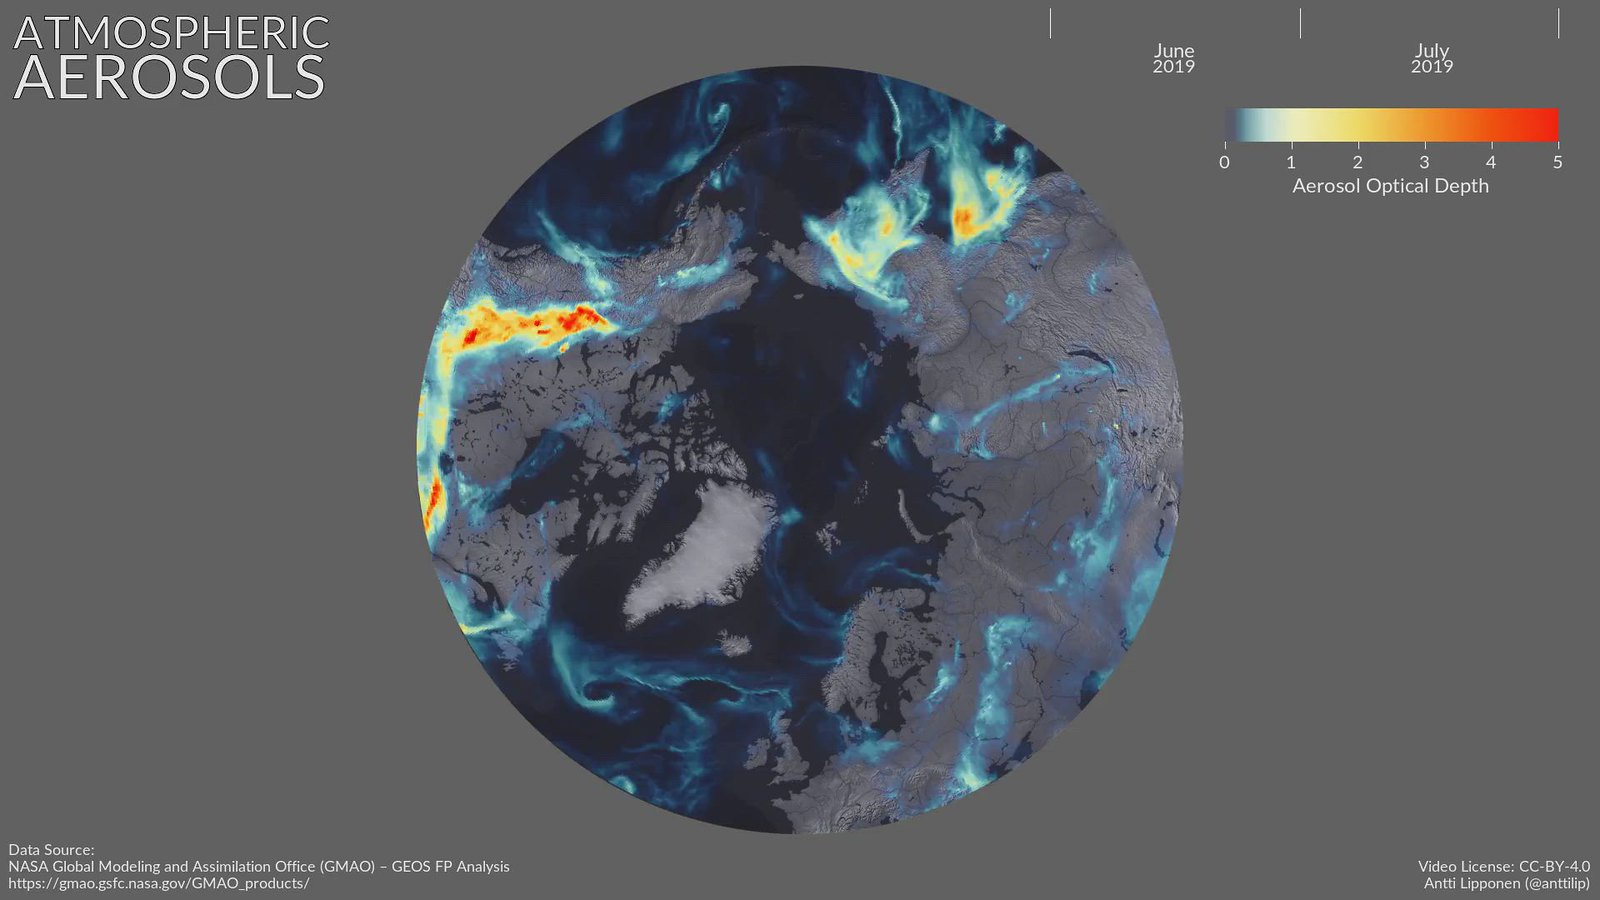 Atmospheric Aerosols June-July 2019